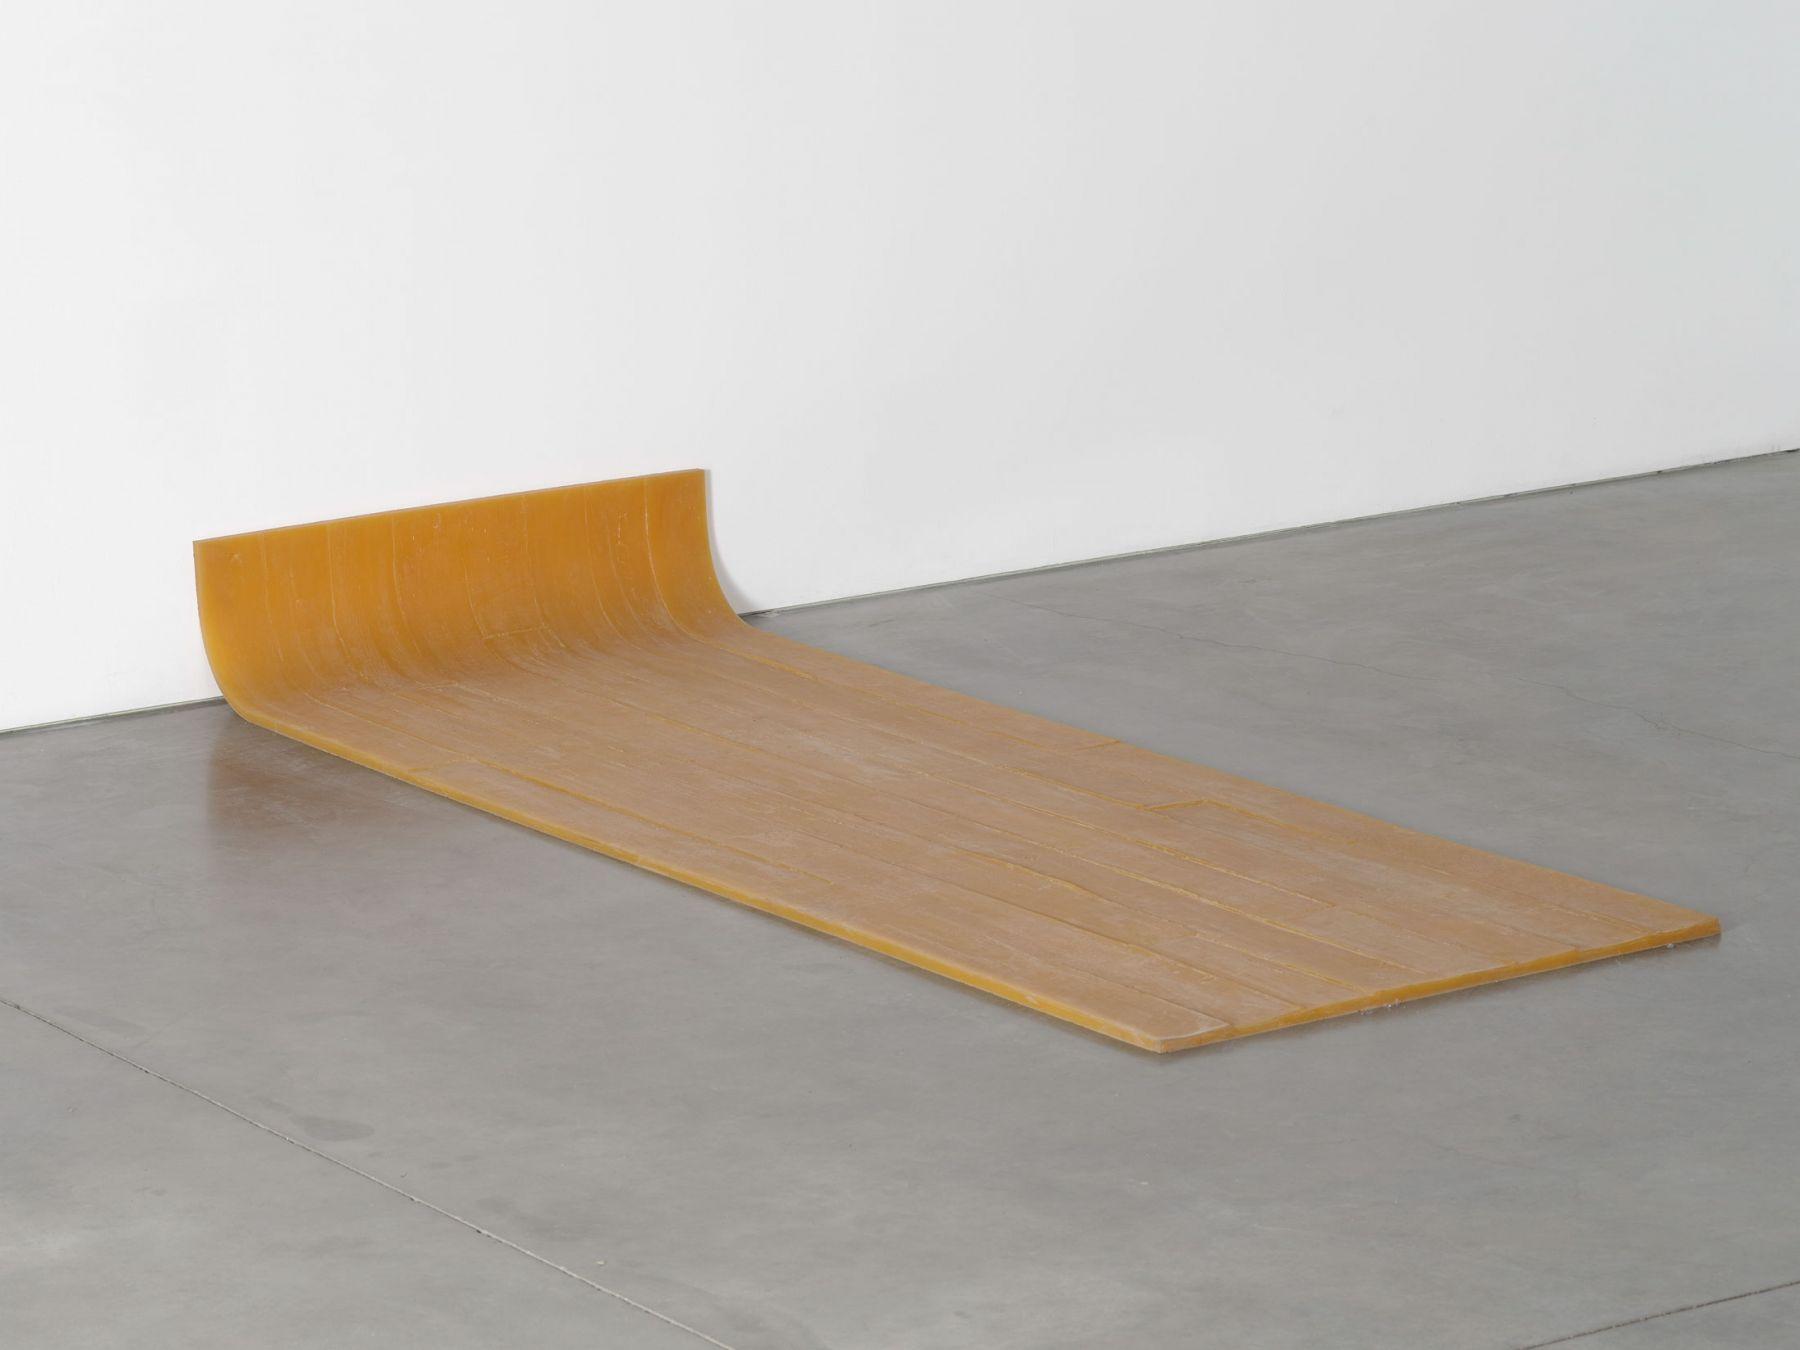 Rachel Whiteread, Untitled (Amber Floor), 1993